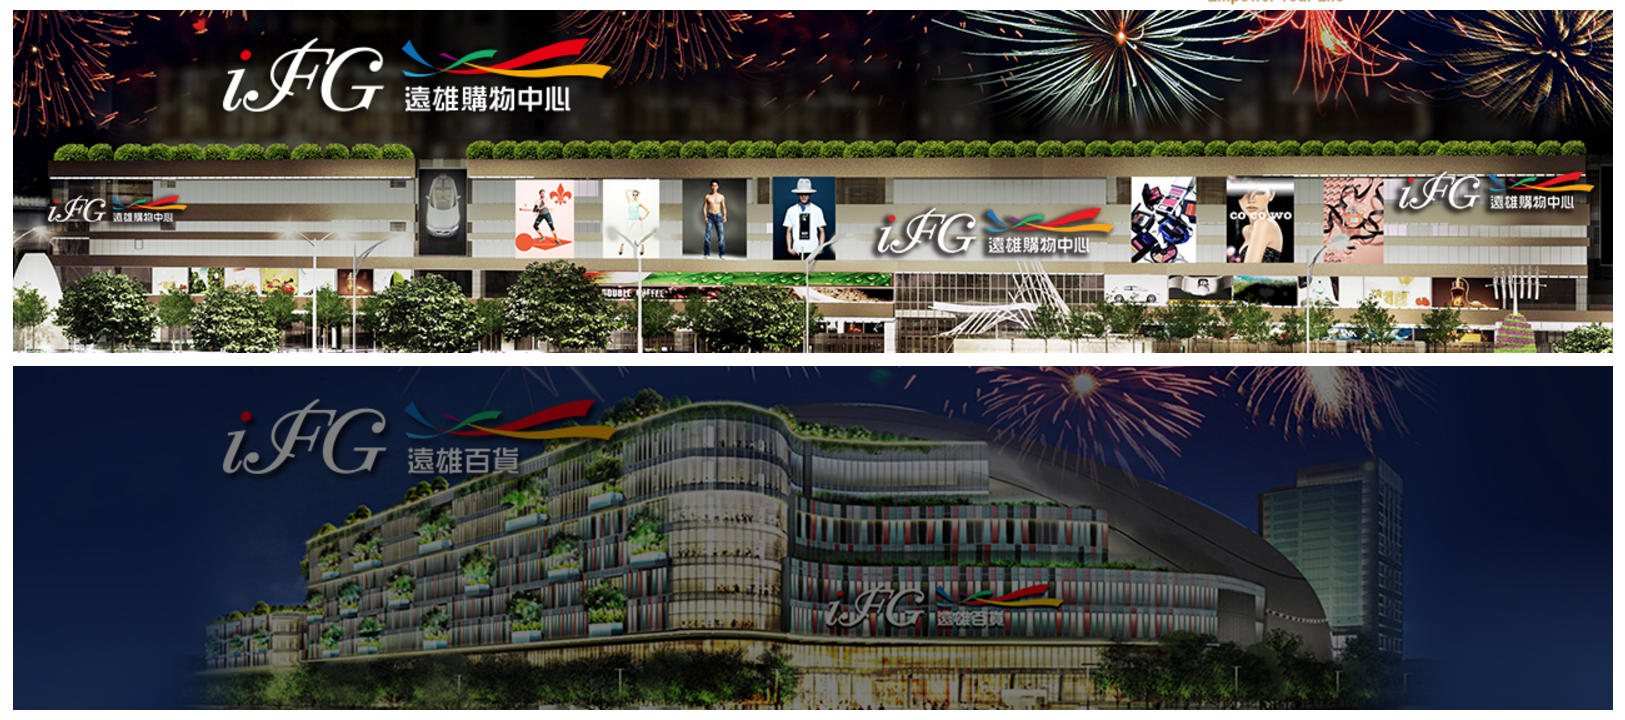 IFG遠雄購物中心(遠雄U-TOWN)